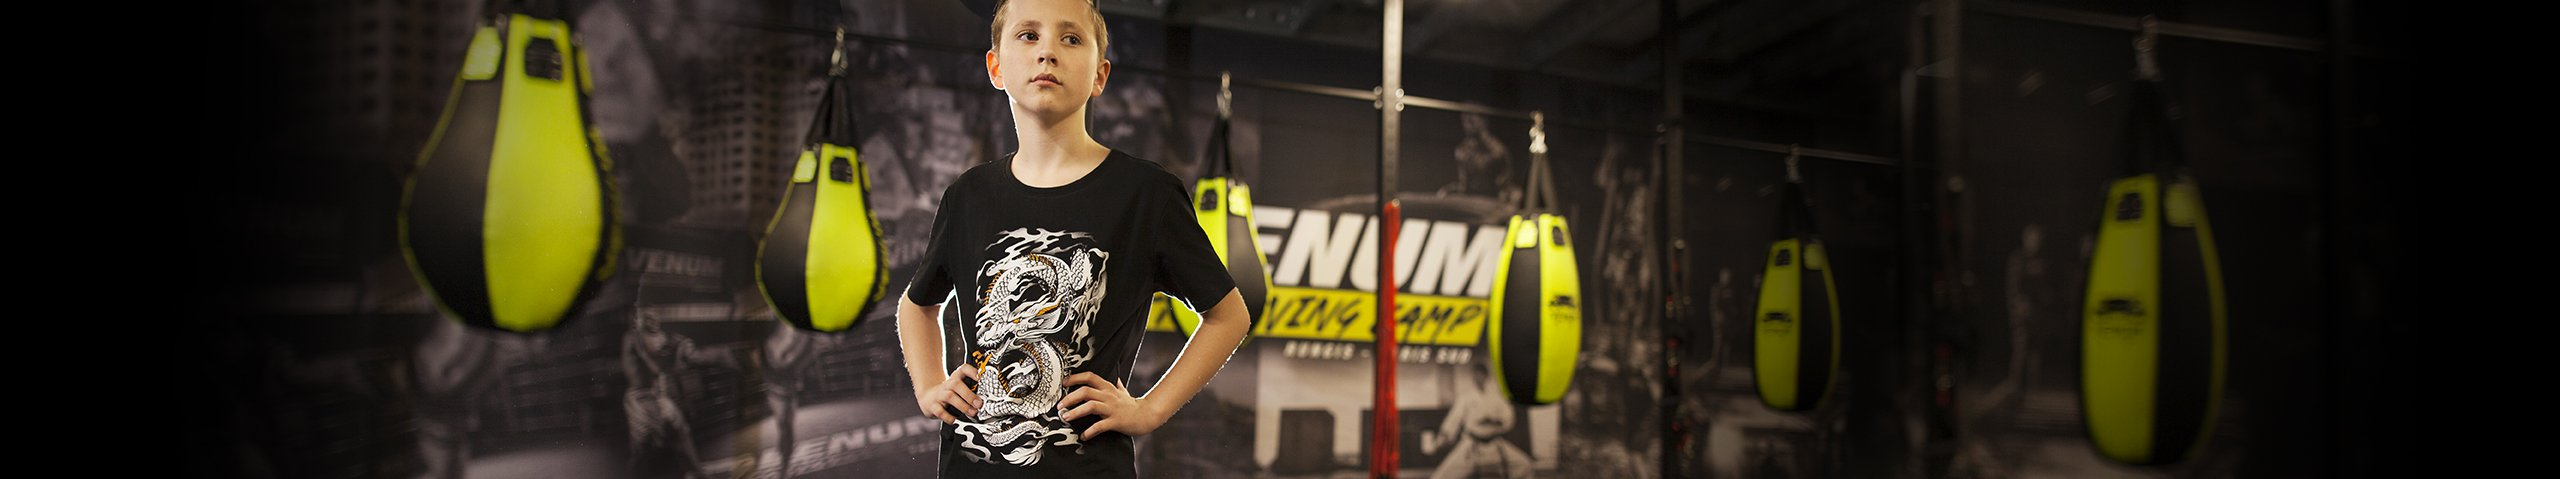 T-shirts Venum - Bambino - Venum.com Italia